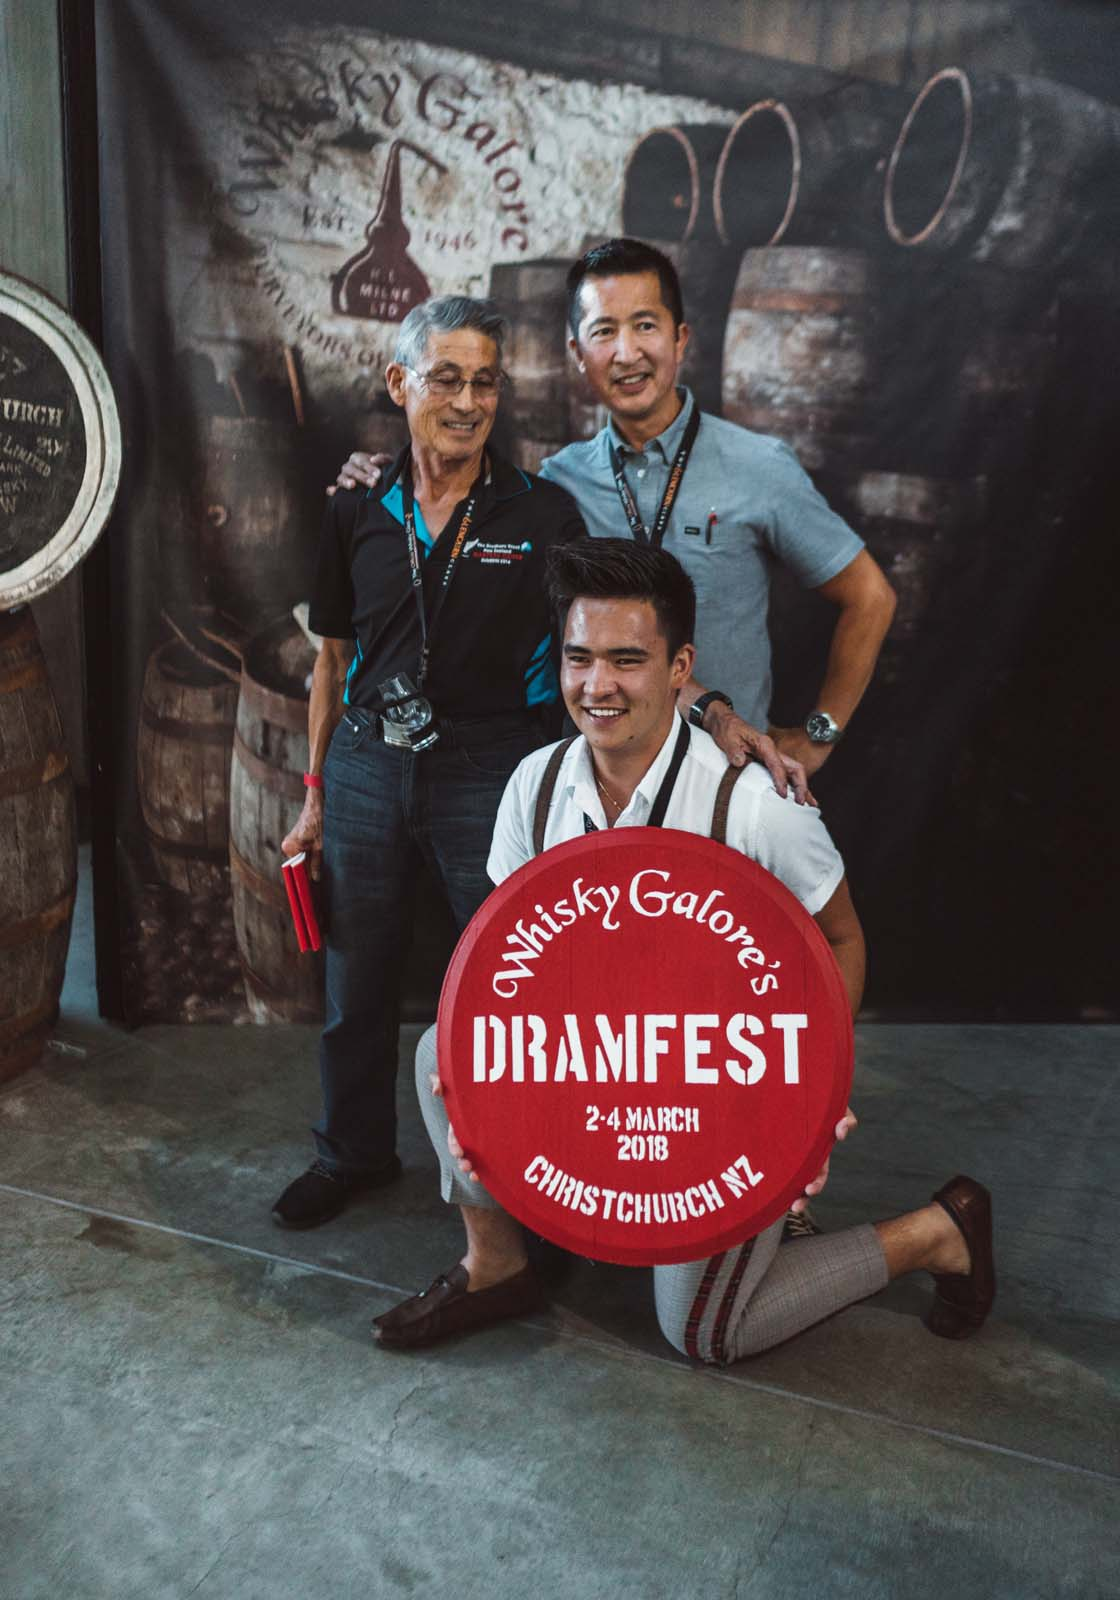 Dramfest 2018 for Whisky Galore-12.jpg